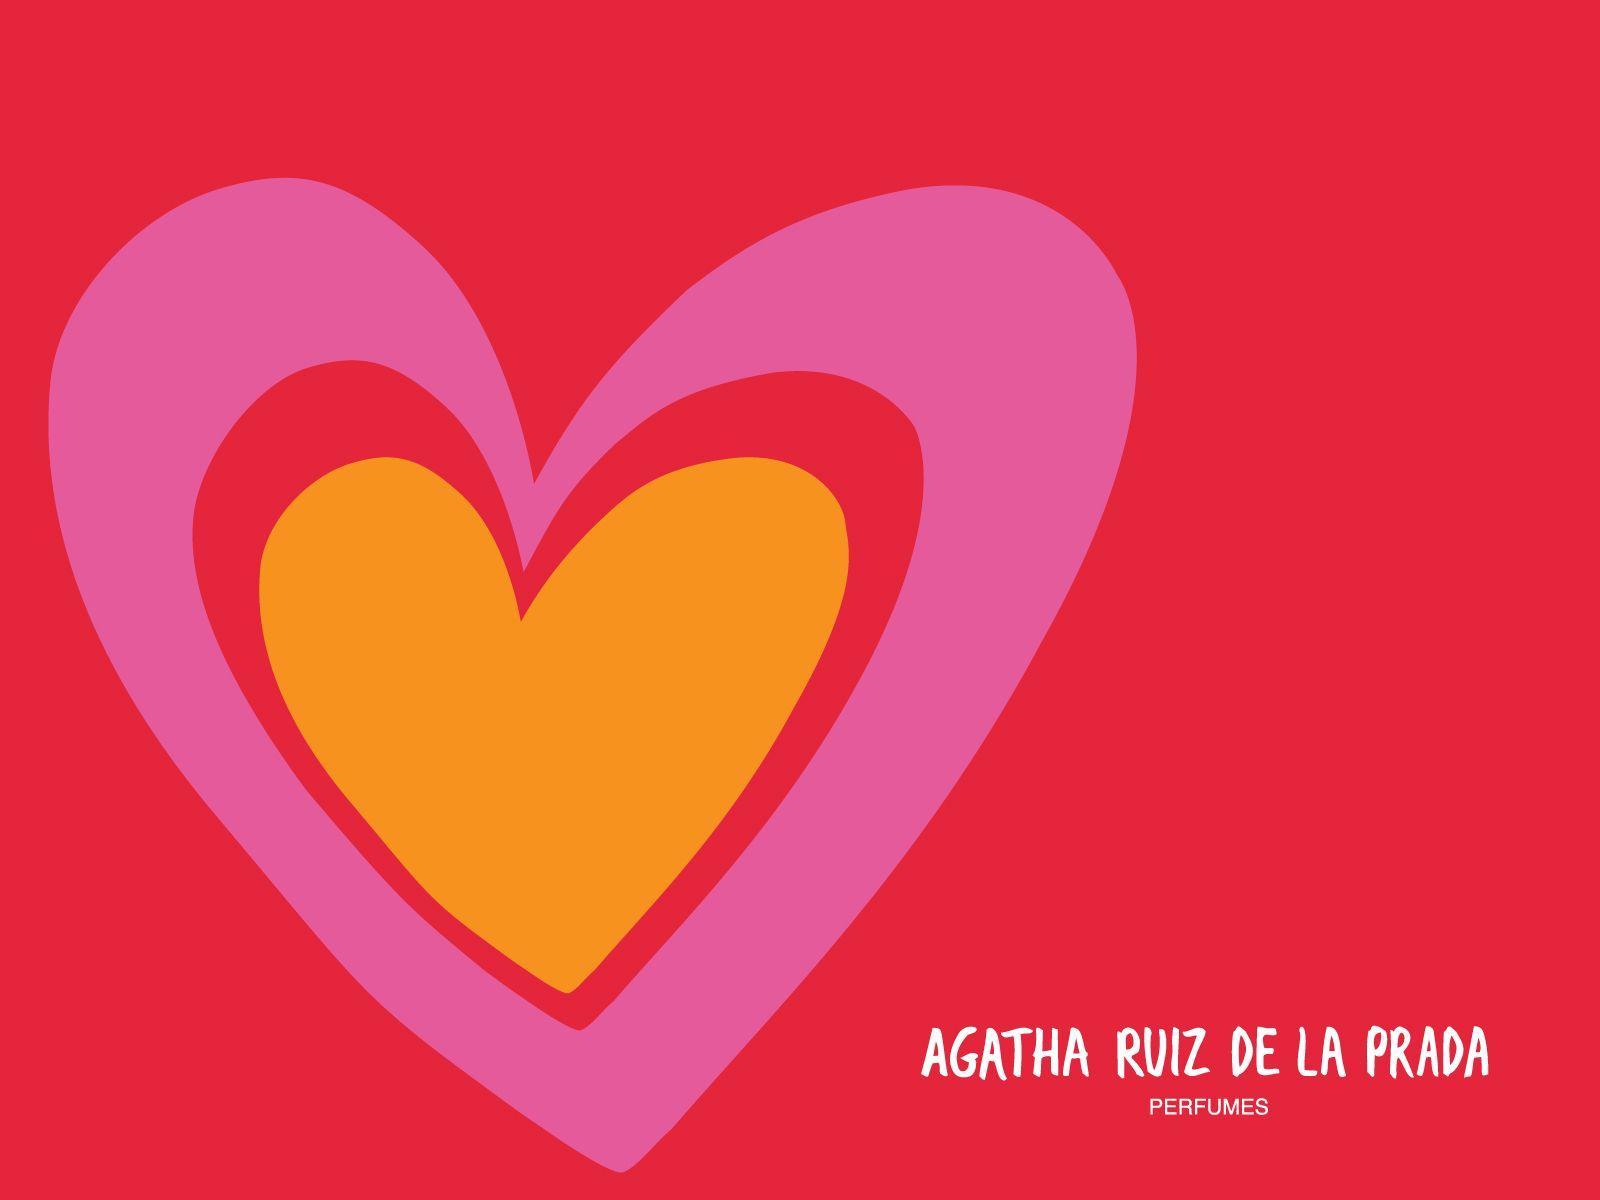 Pagina Monograma Http Justagirlandherblog Com How To Create A Monogram In Word Prada Ruiz Ilustraciones